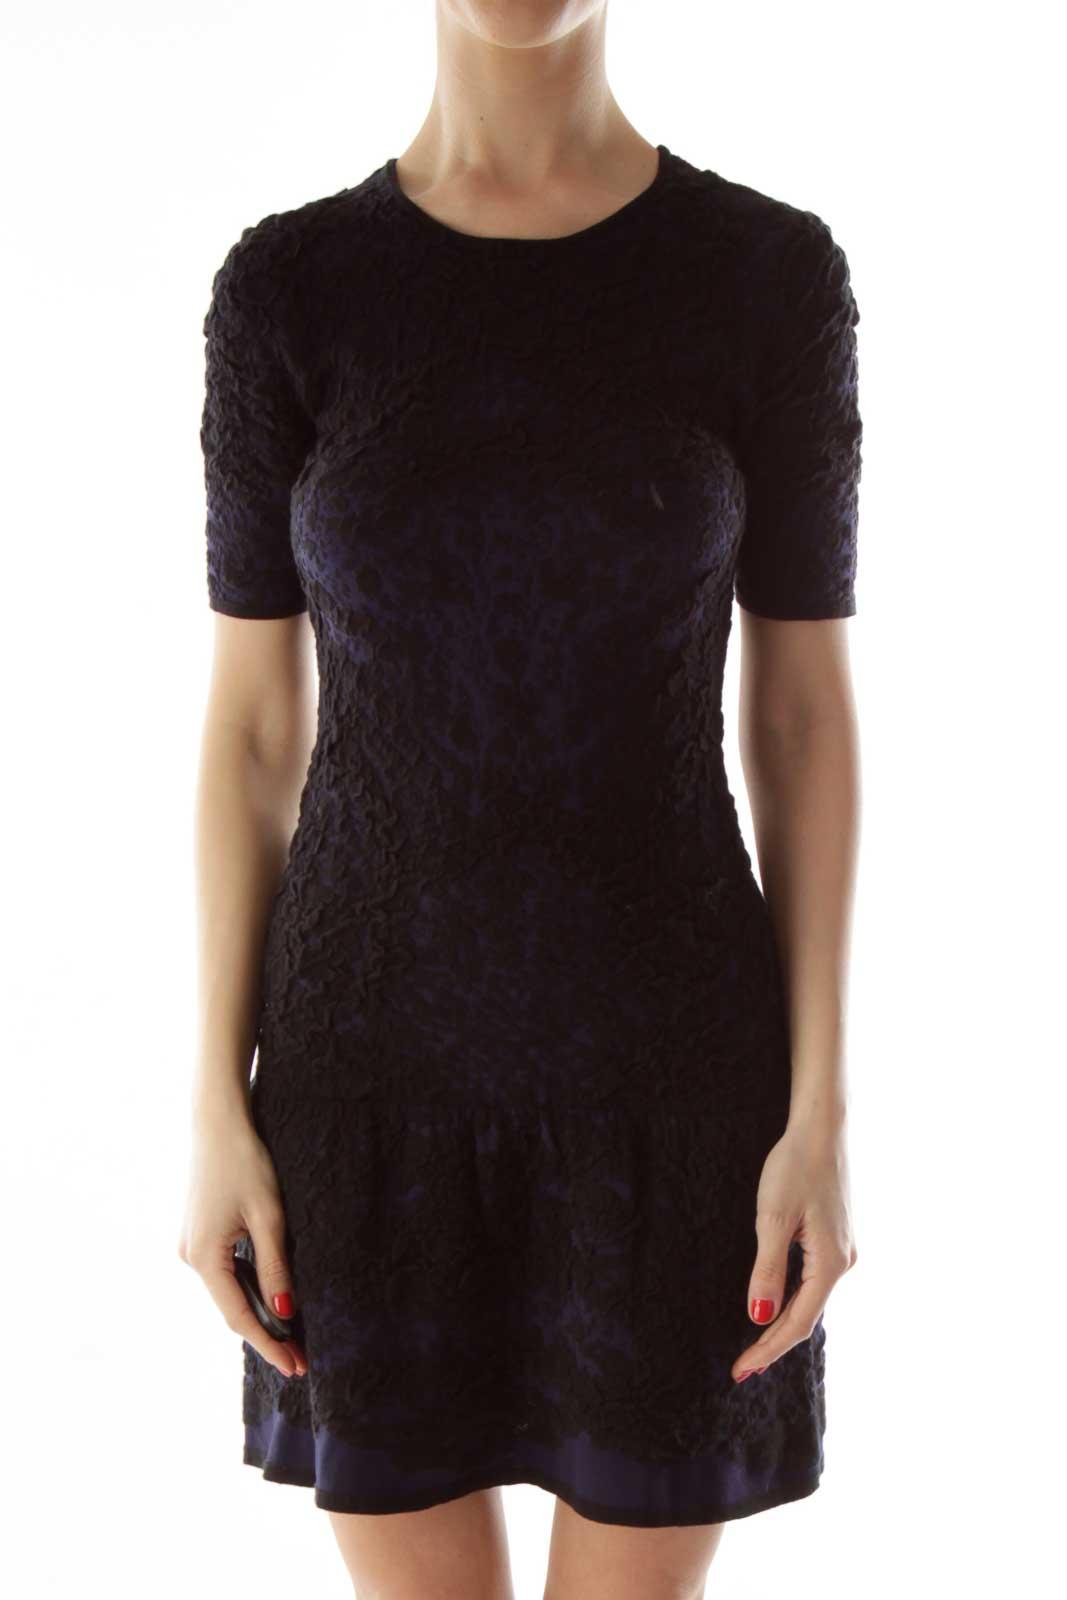 Black Navy Short-Sleeve Textured Elastic Dress Front